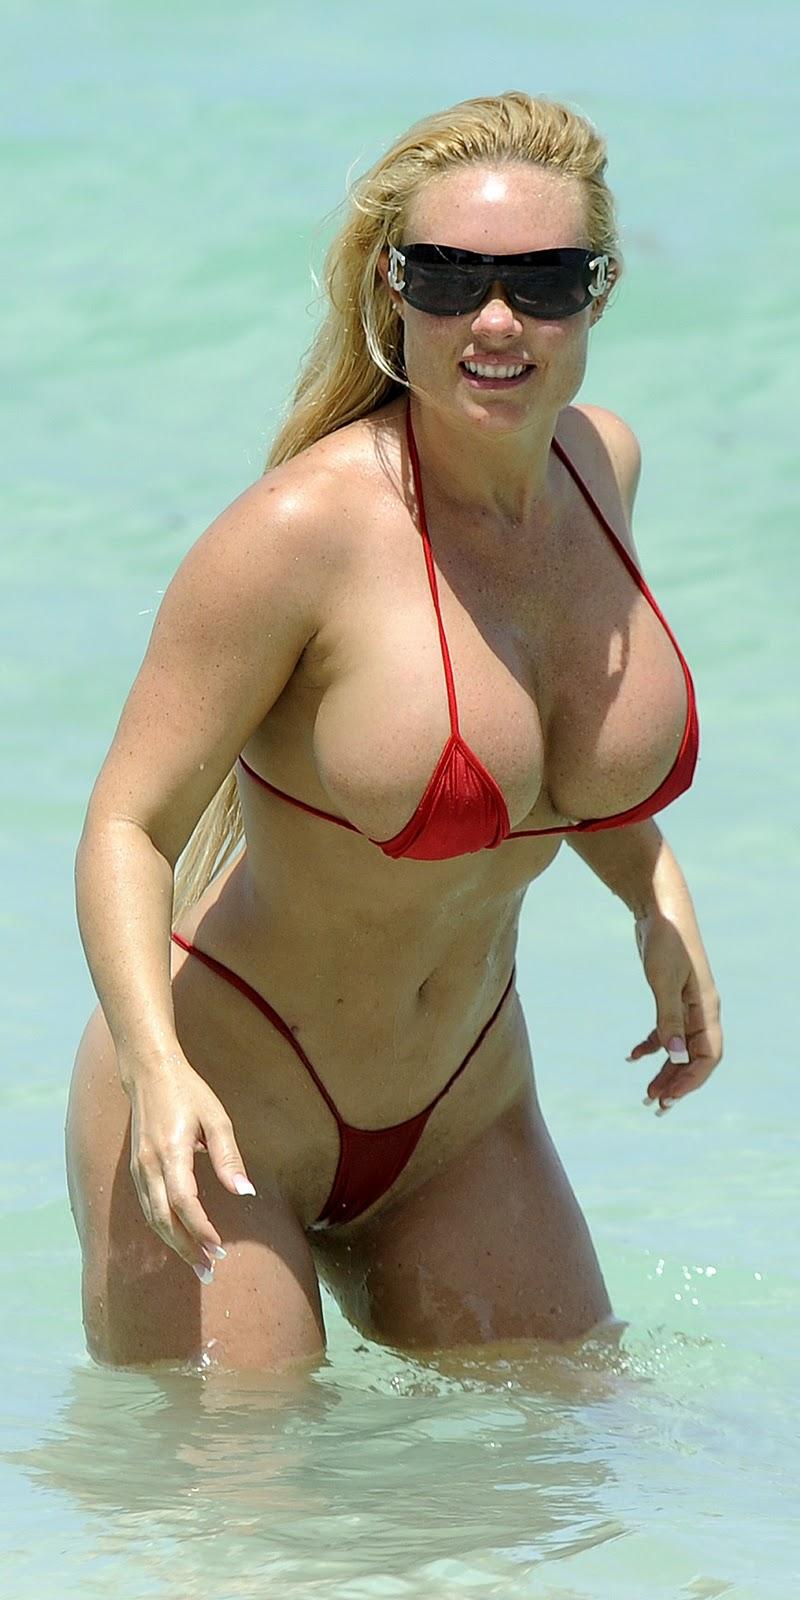 Austin thong bikini coco